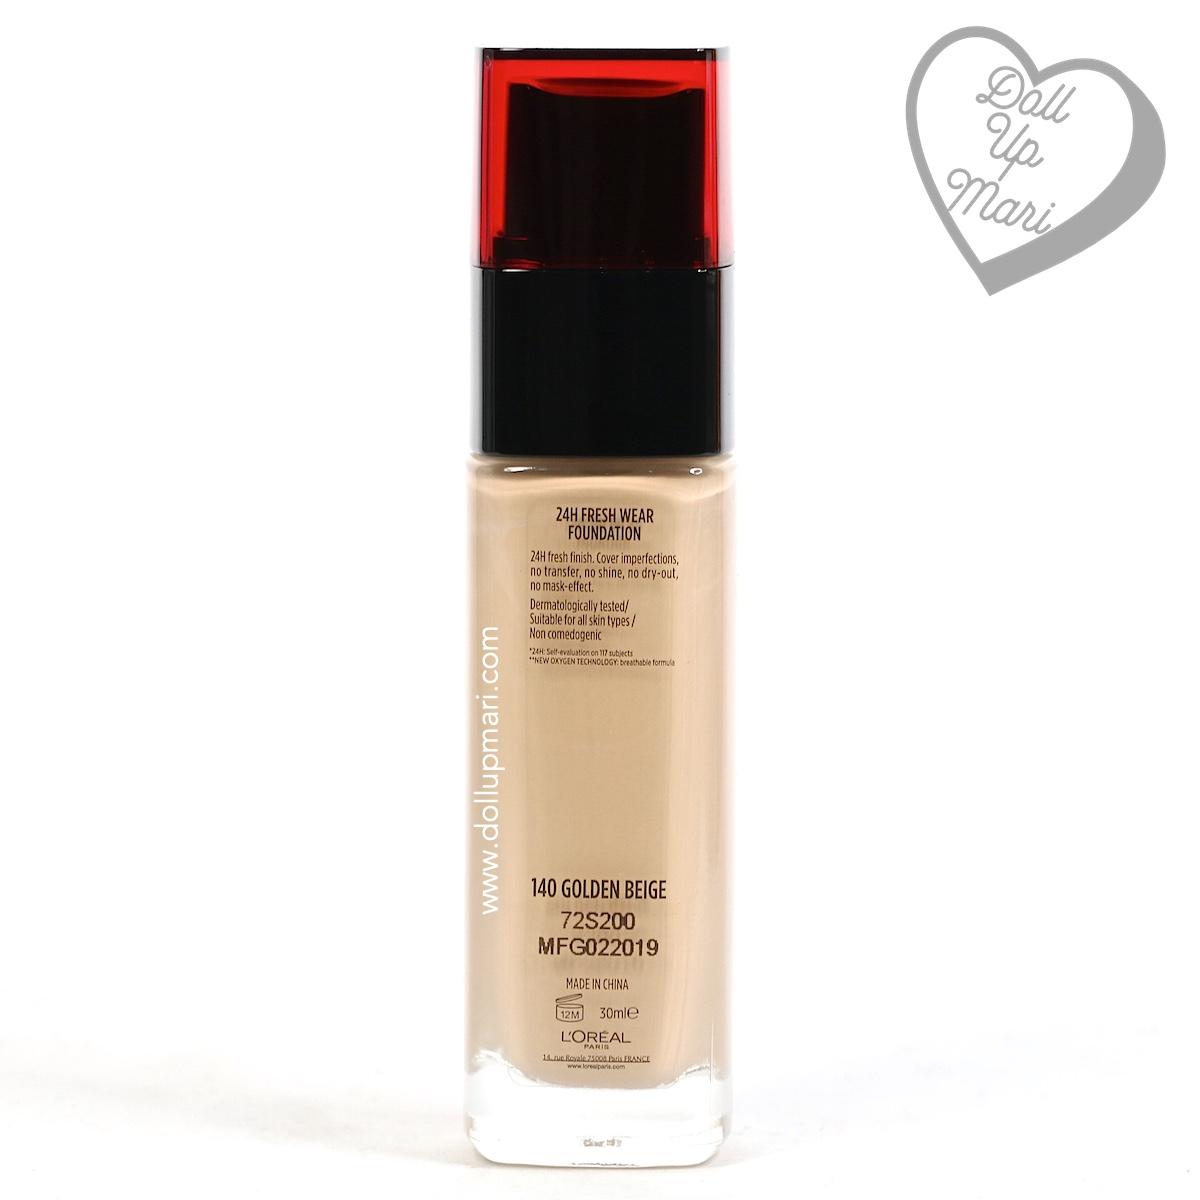 Bottle Rear L'Oréal Paris Infallible 24HR Fresh Wear Liquid Foundation SPF25PA+++ in shade Golden Beige